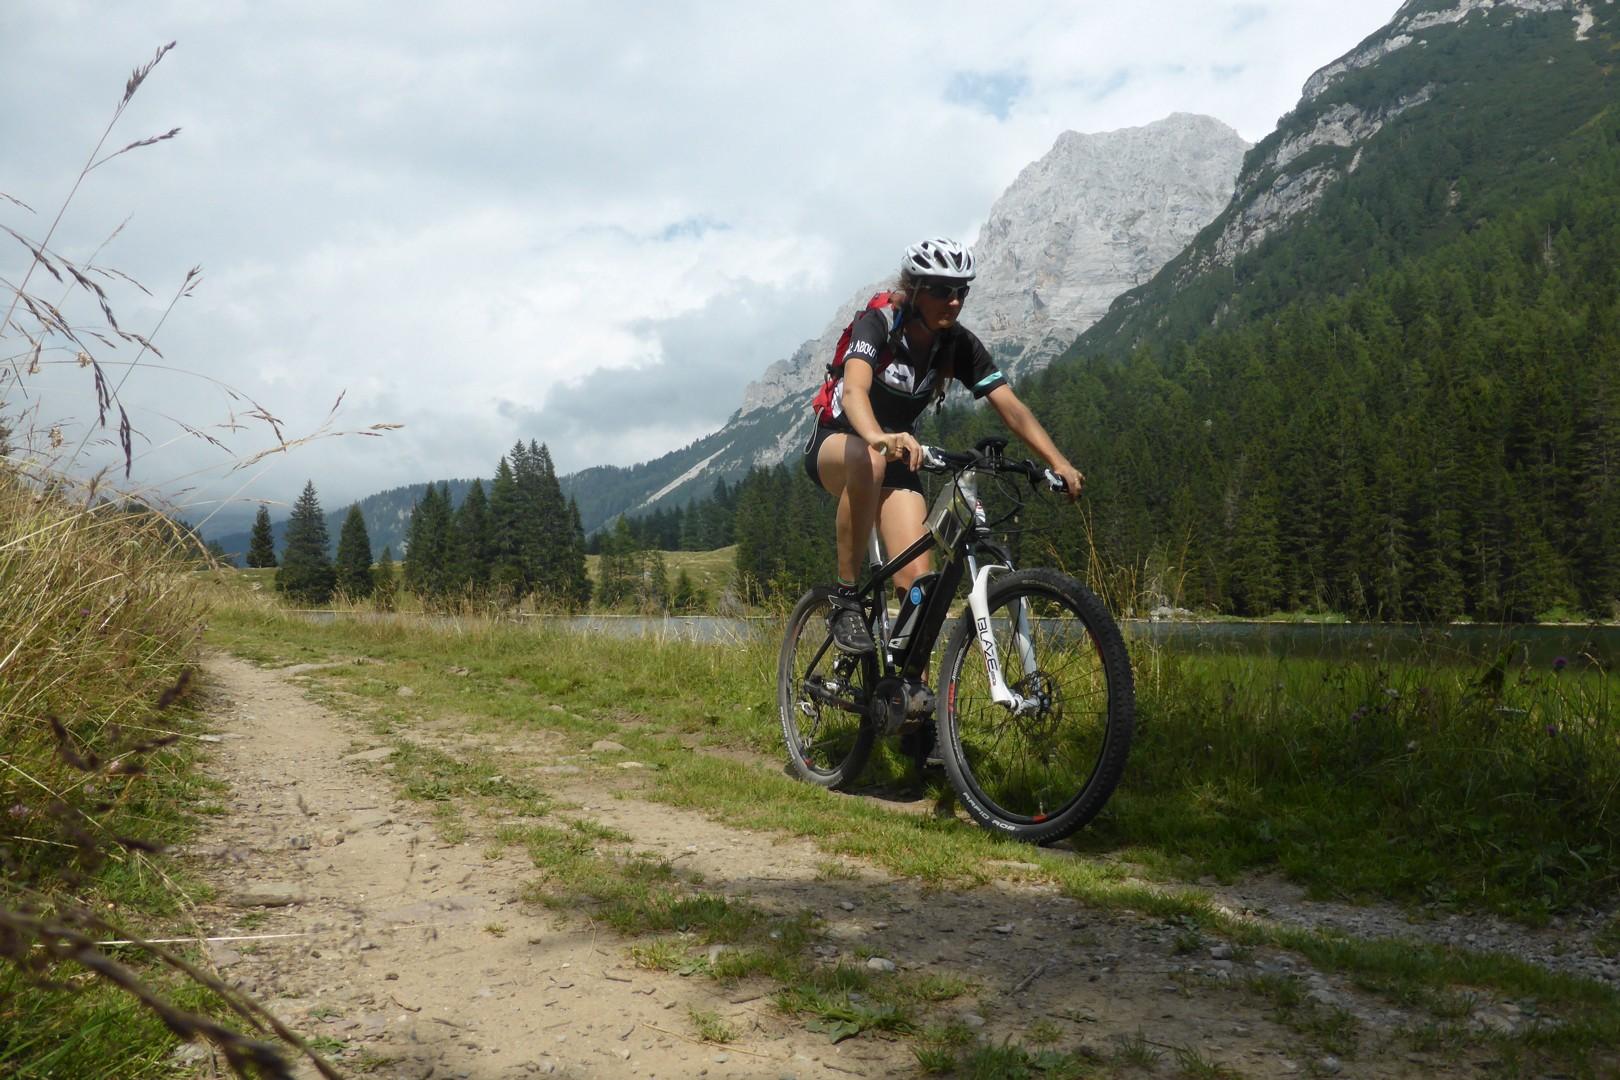 Dolomiti MTB - 1323.jpg - Italy - Dolomites of Brenta - Guided Mountain Bike Holiday - Mountain Biking